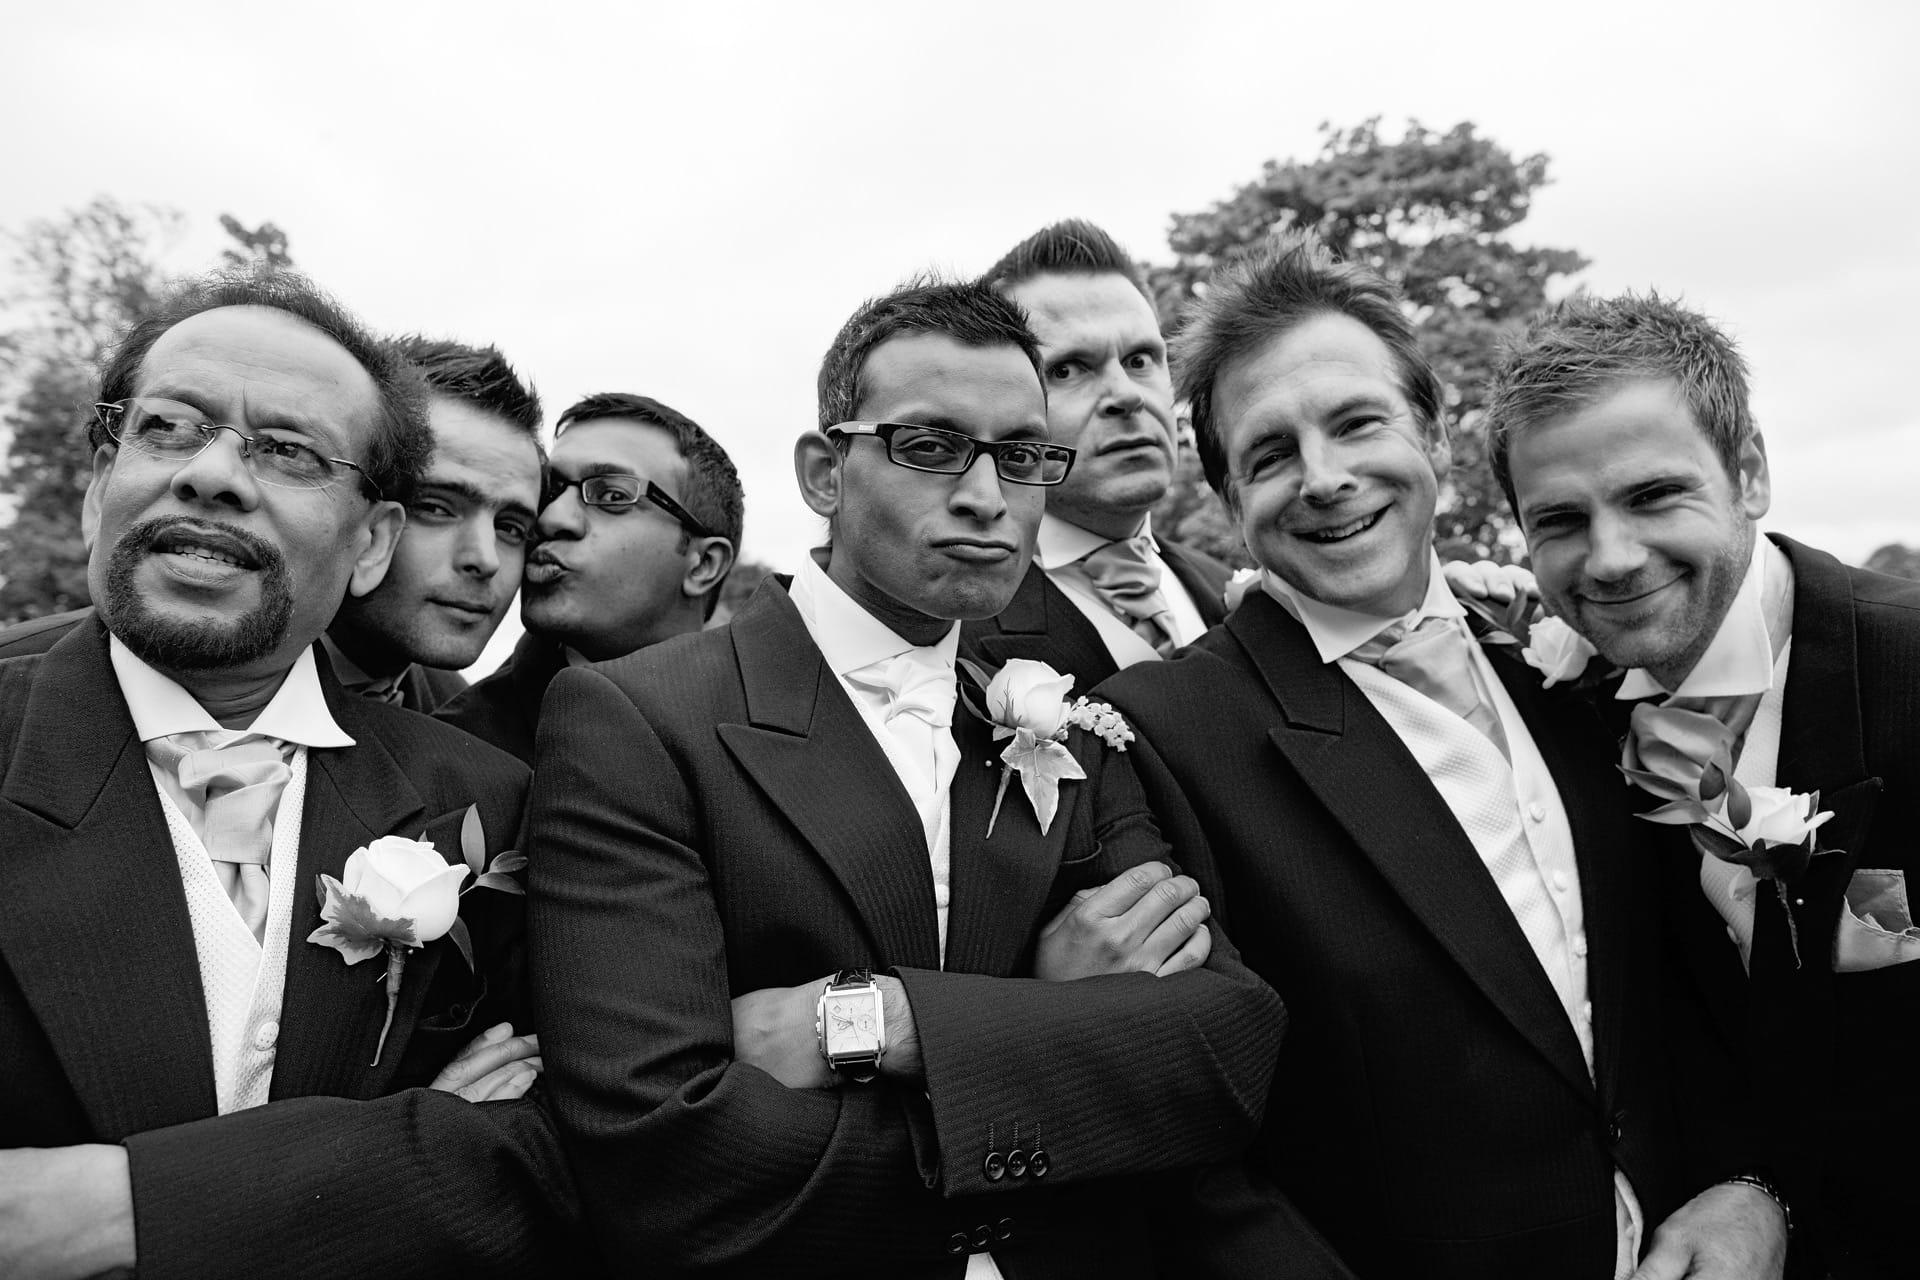 wedding-party-formal-groomsmen-fun